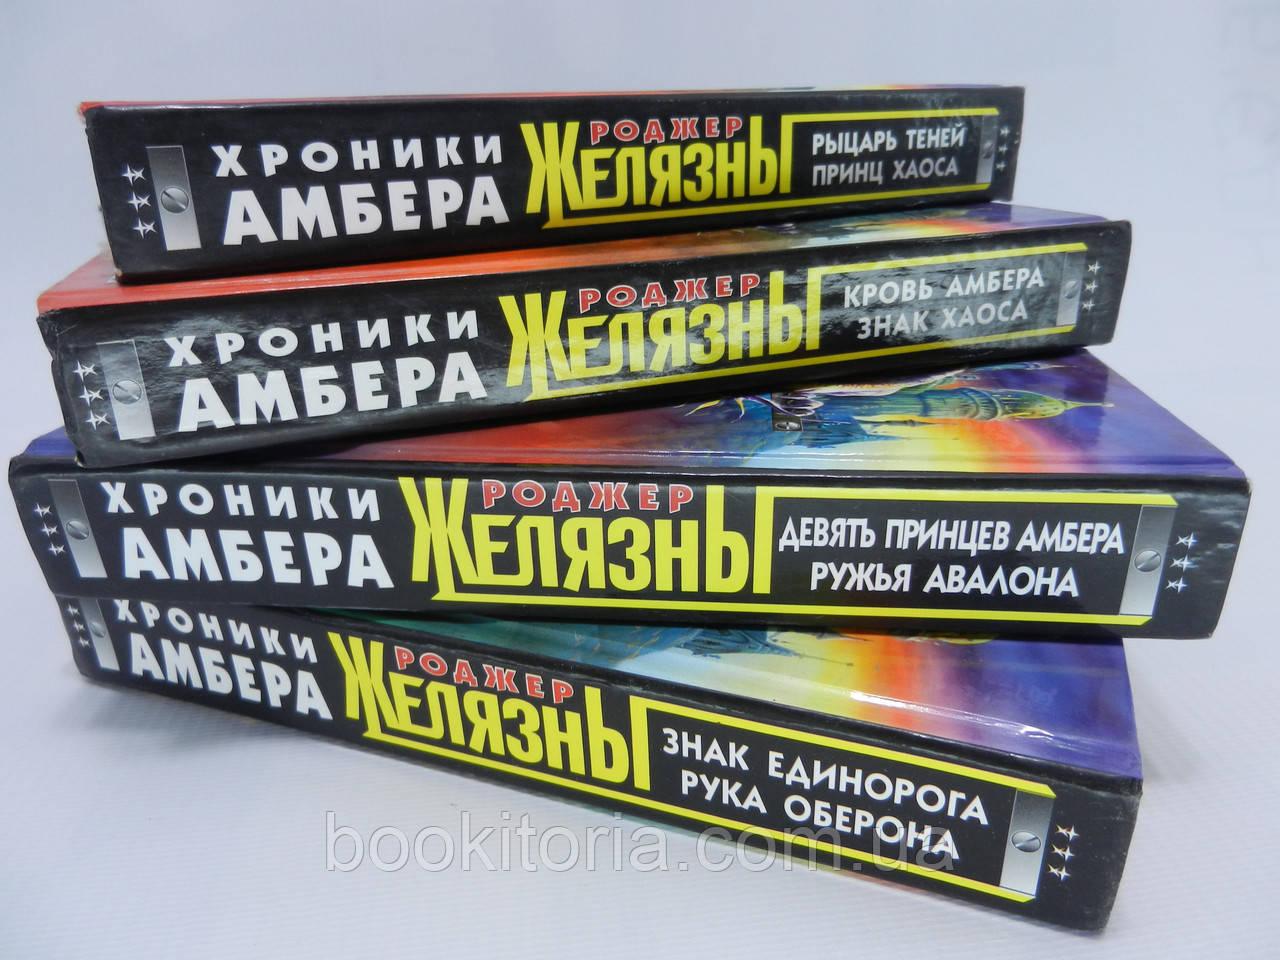 Желязны Р. Хроники Амбера. В 6 томах. 4 тома из 6 (б/у).